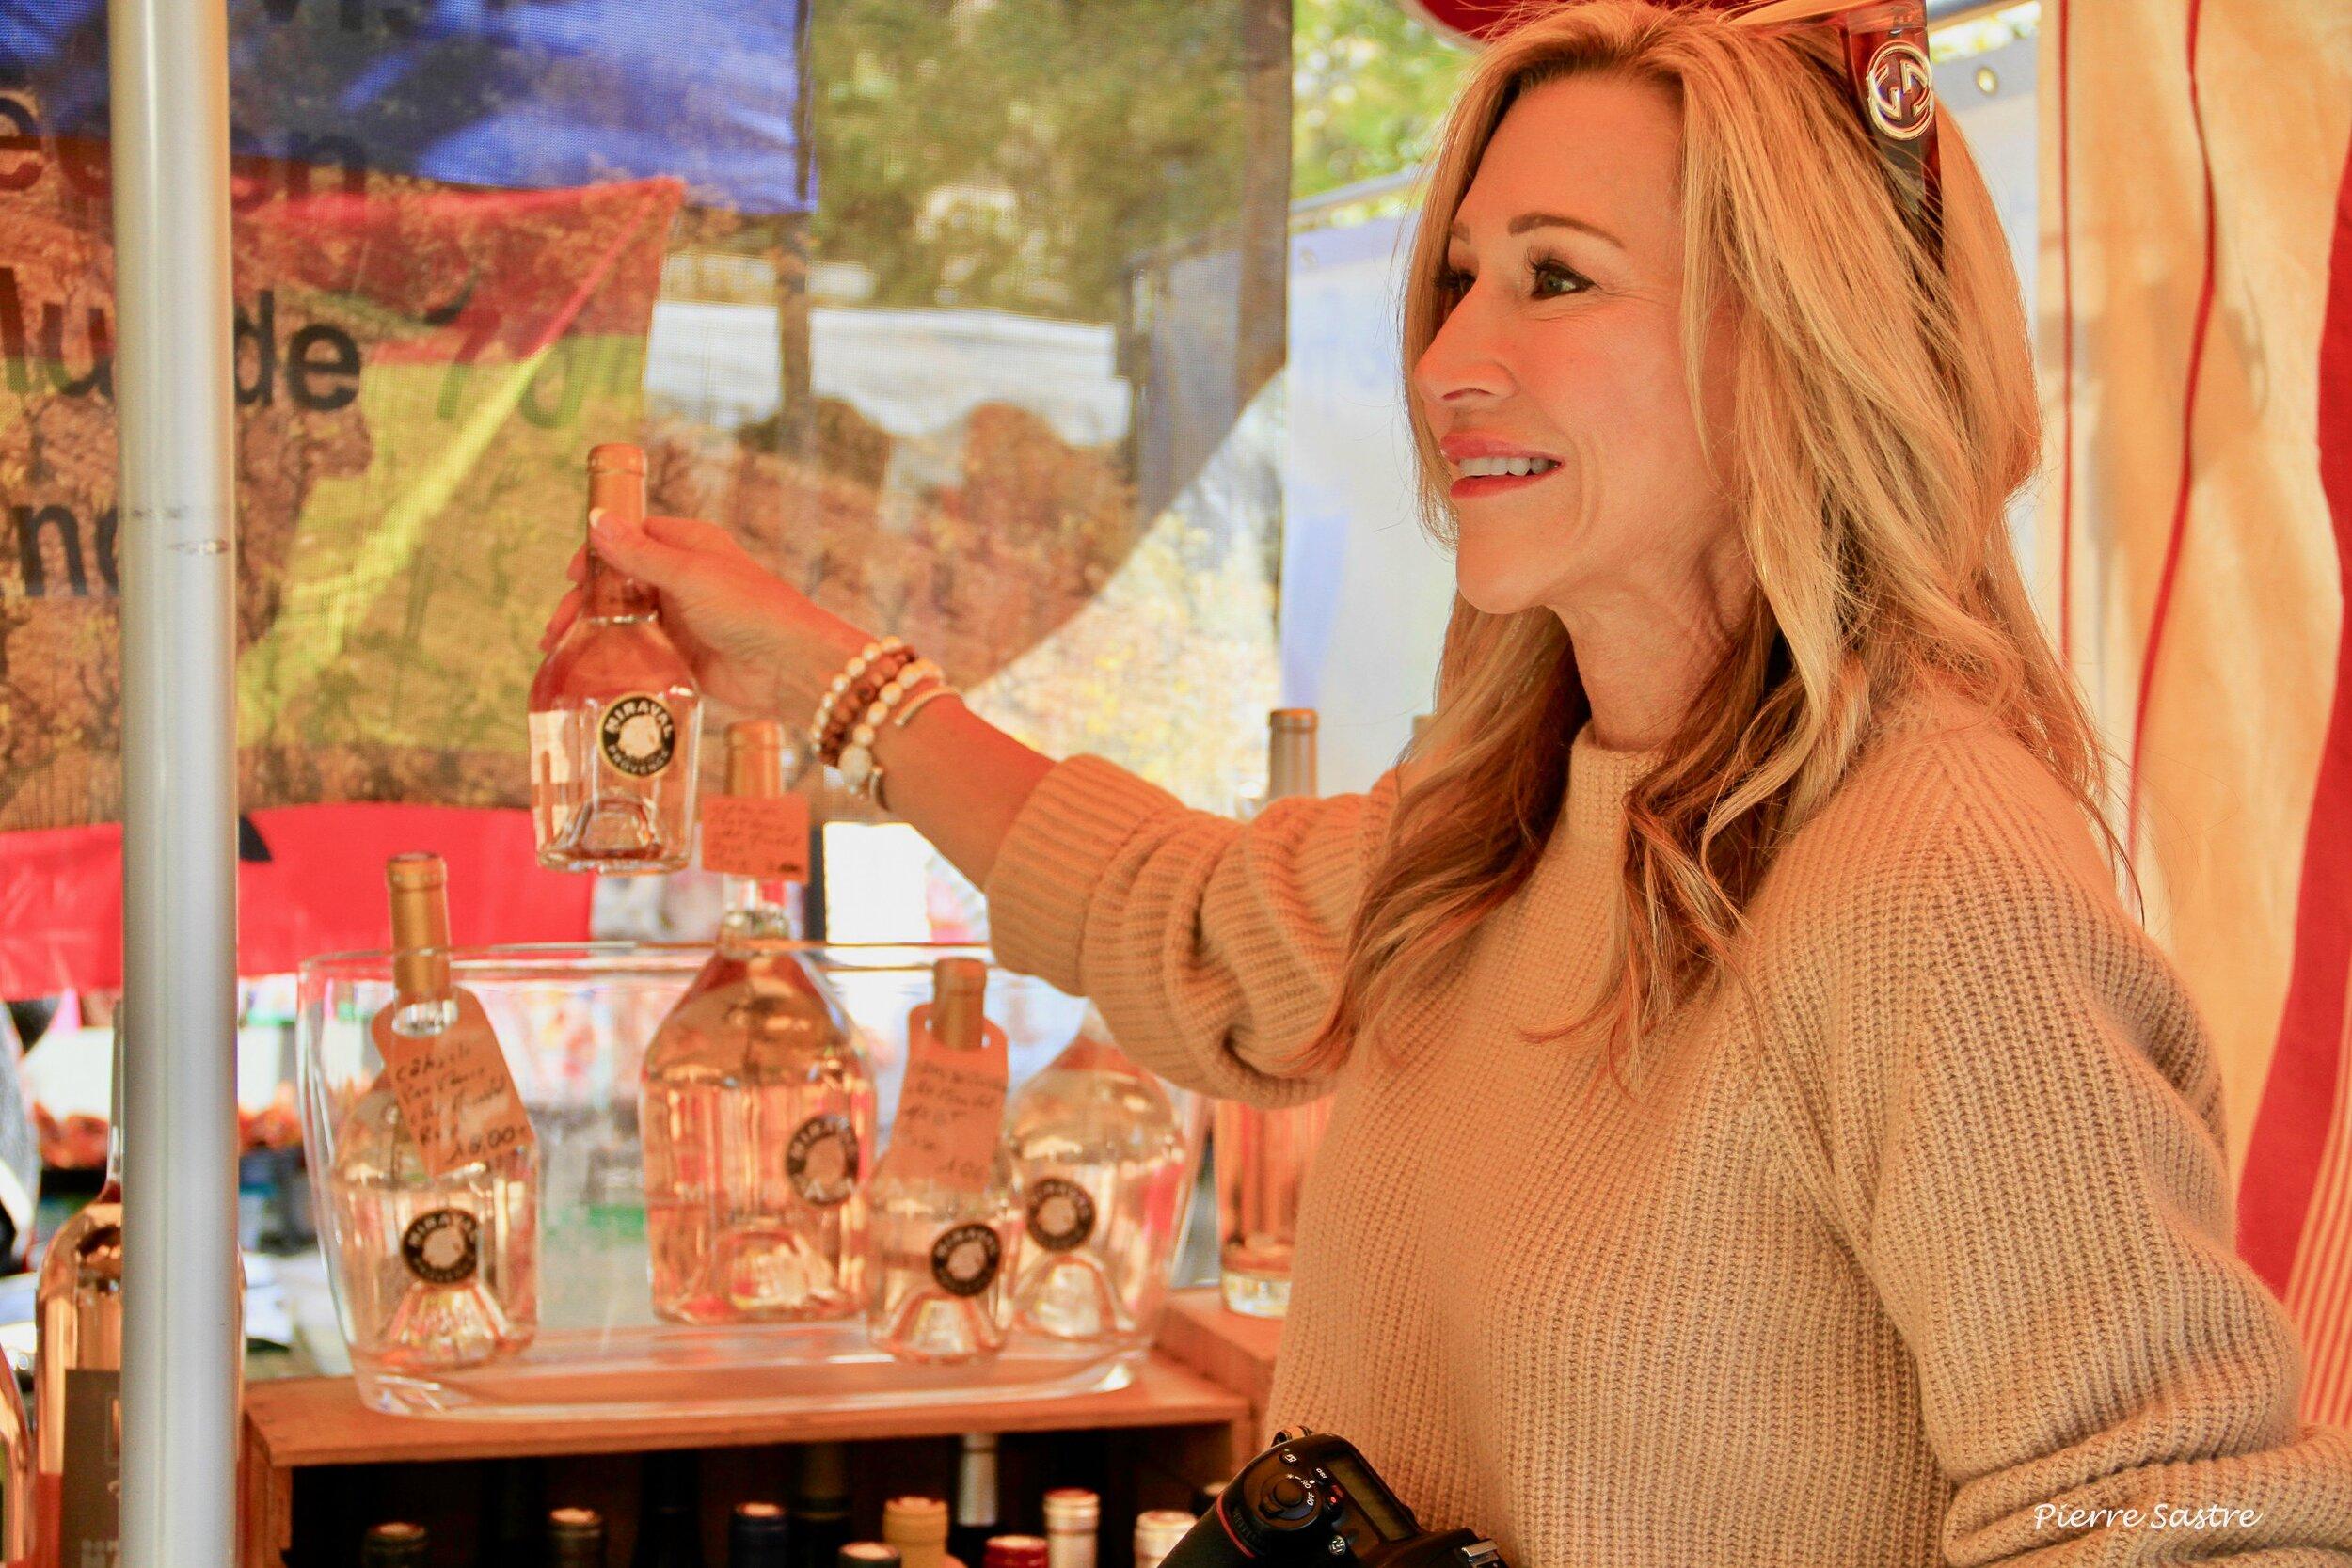 The Market in Lourmarin - Crazy Blonde Life